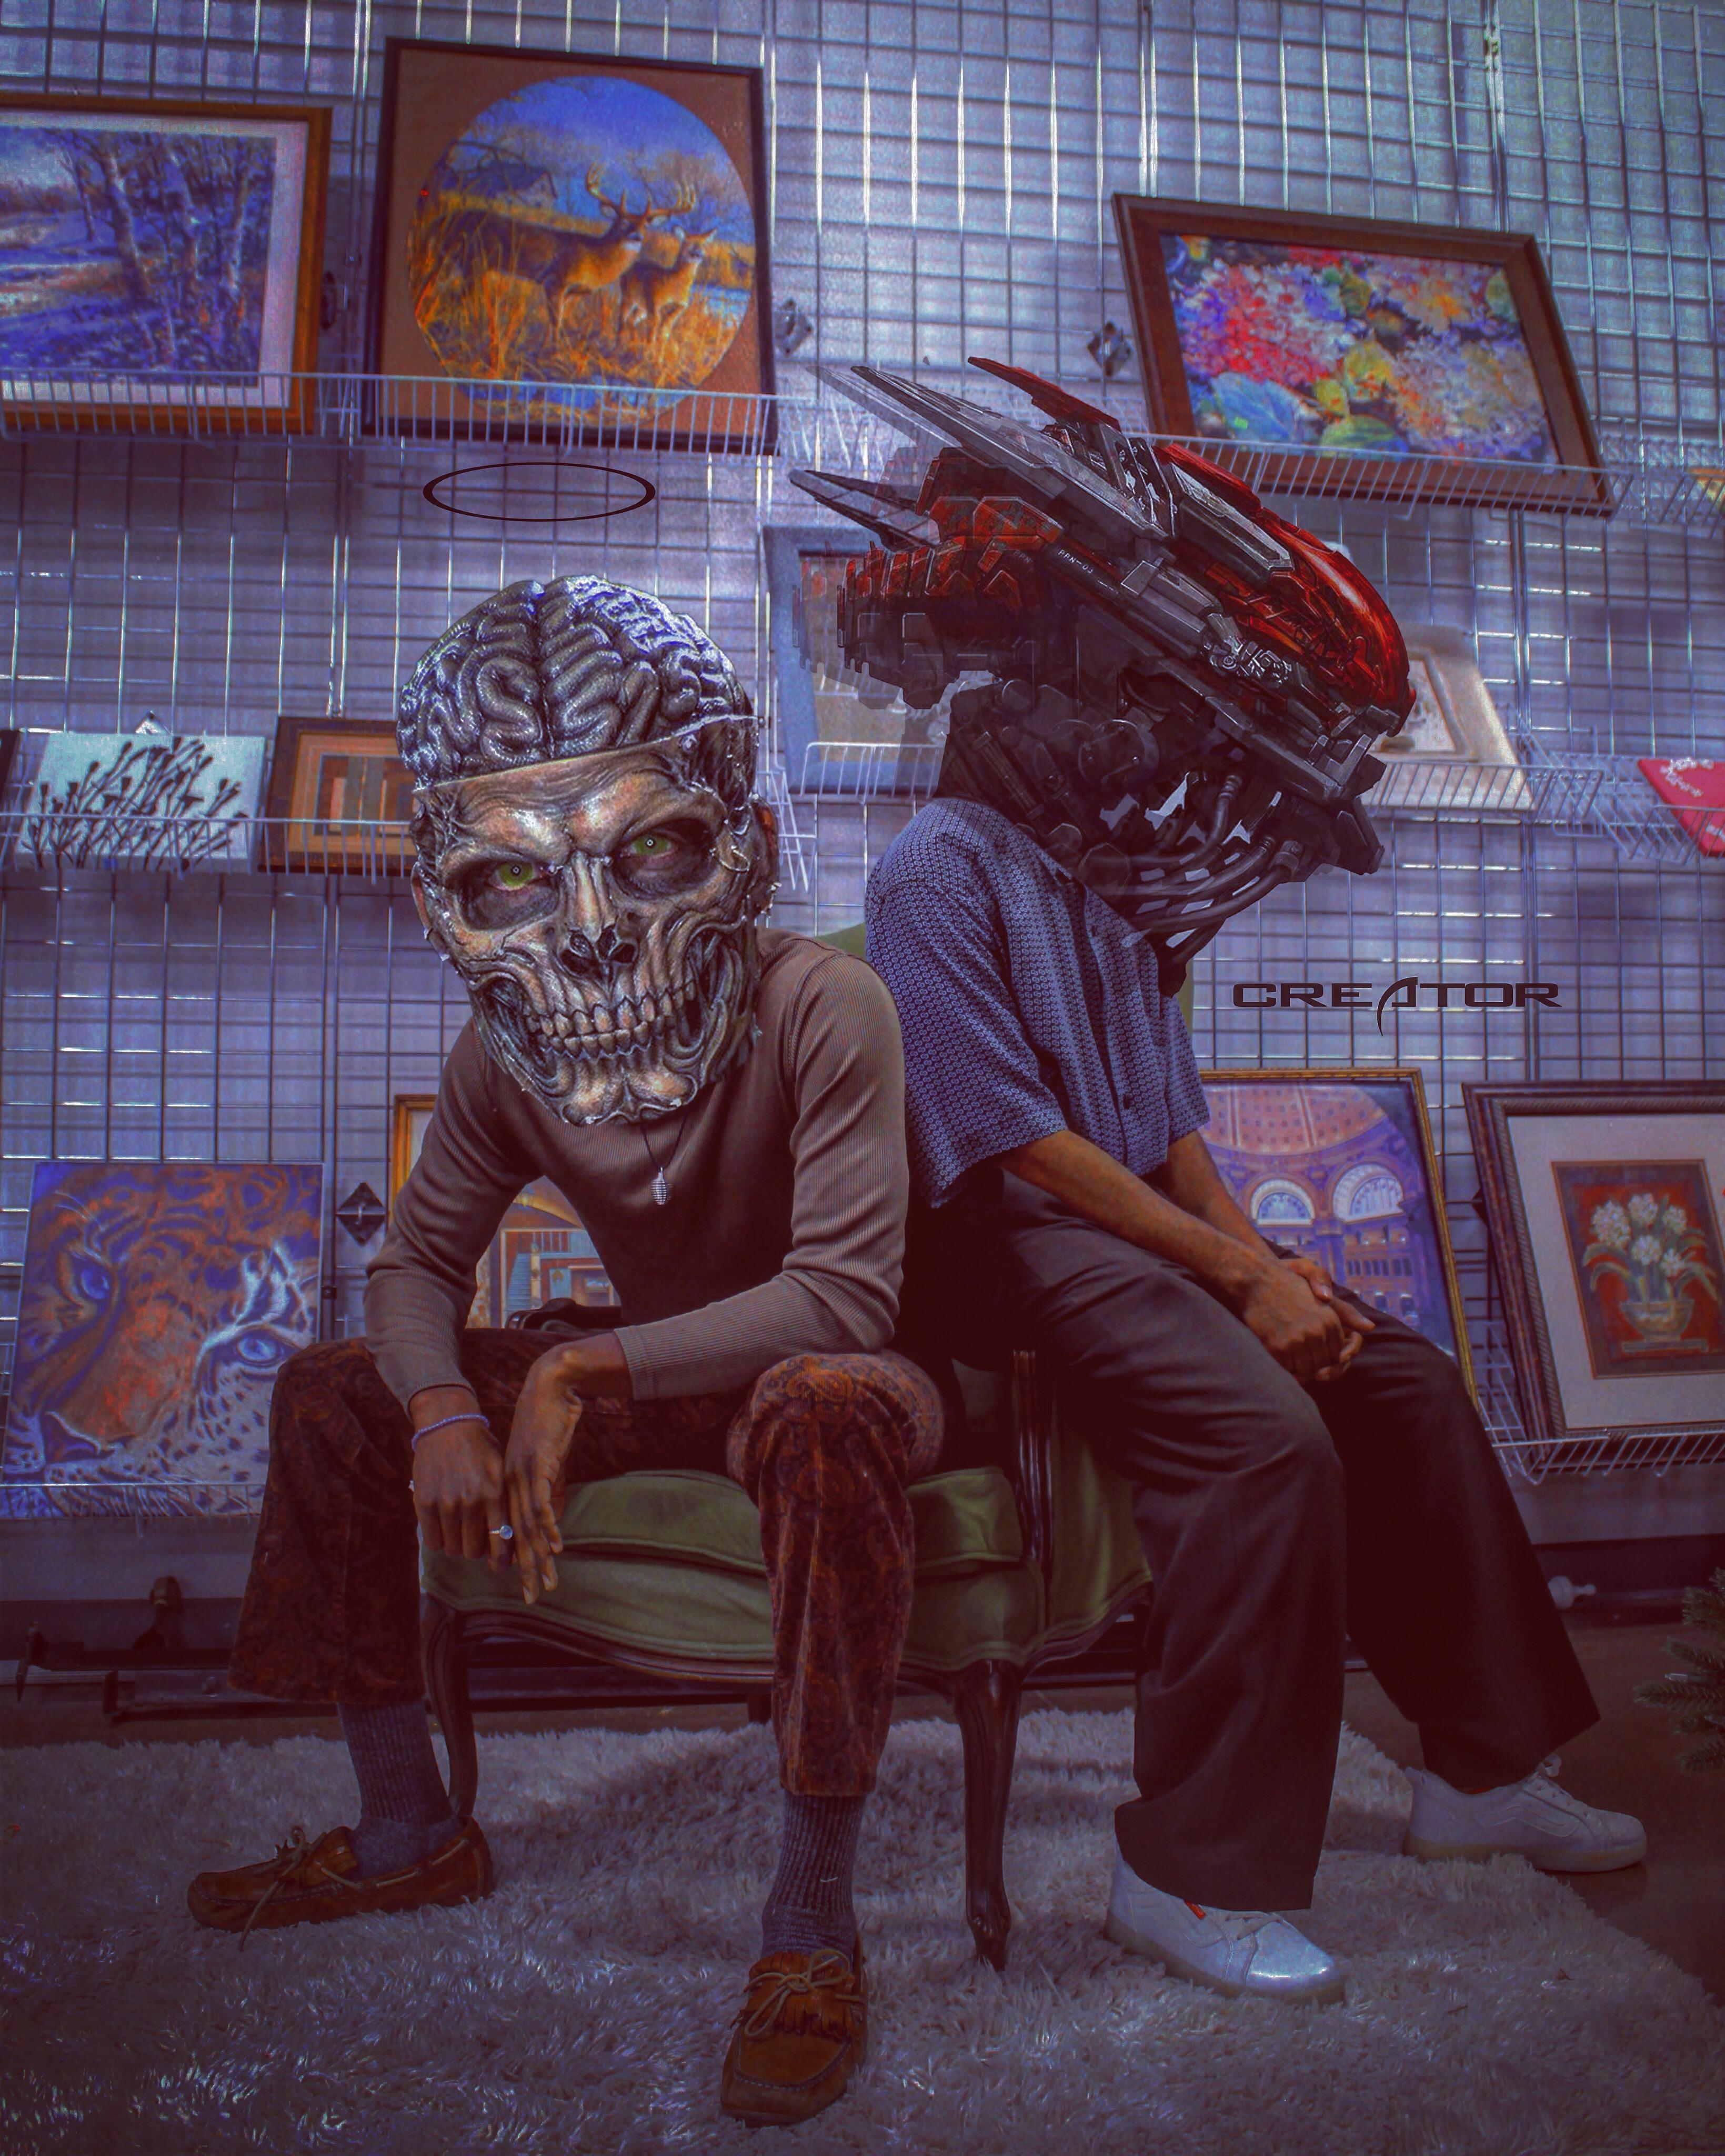 B93C4FED 3E96 4706 B782 FFA3E30FB59D1 - The Nigerian Anonymous Digital Artist whose Work Will Make You Shiver!